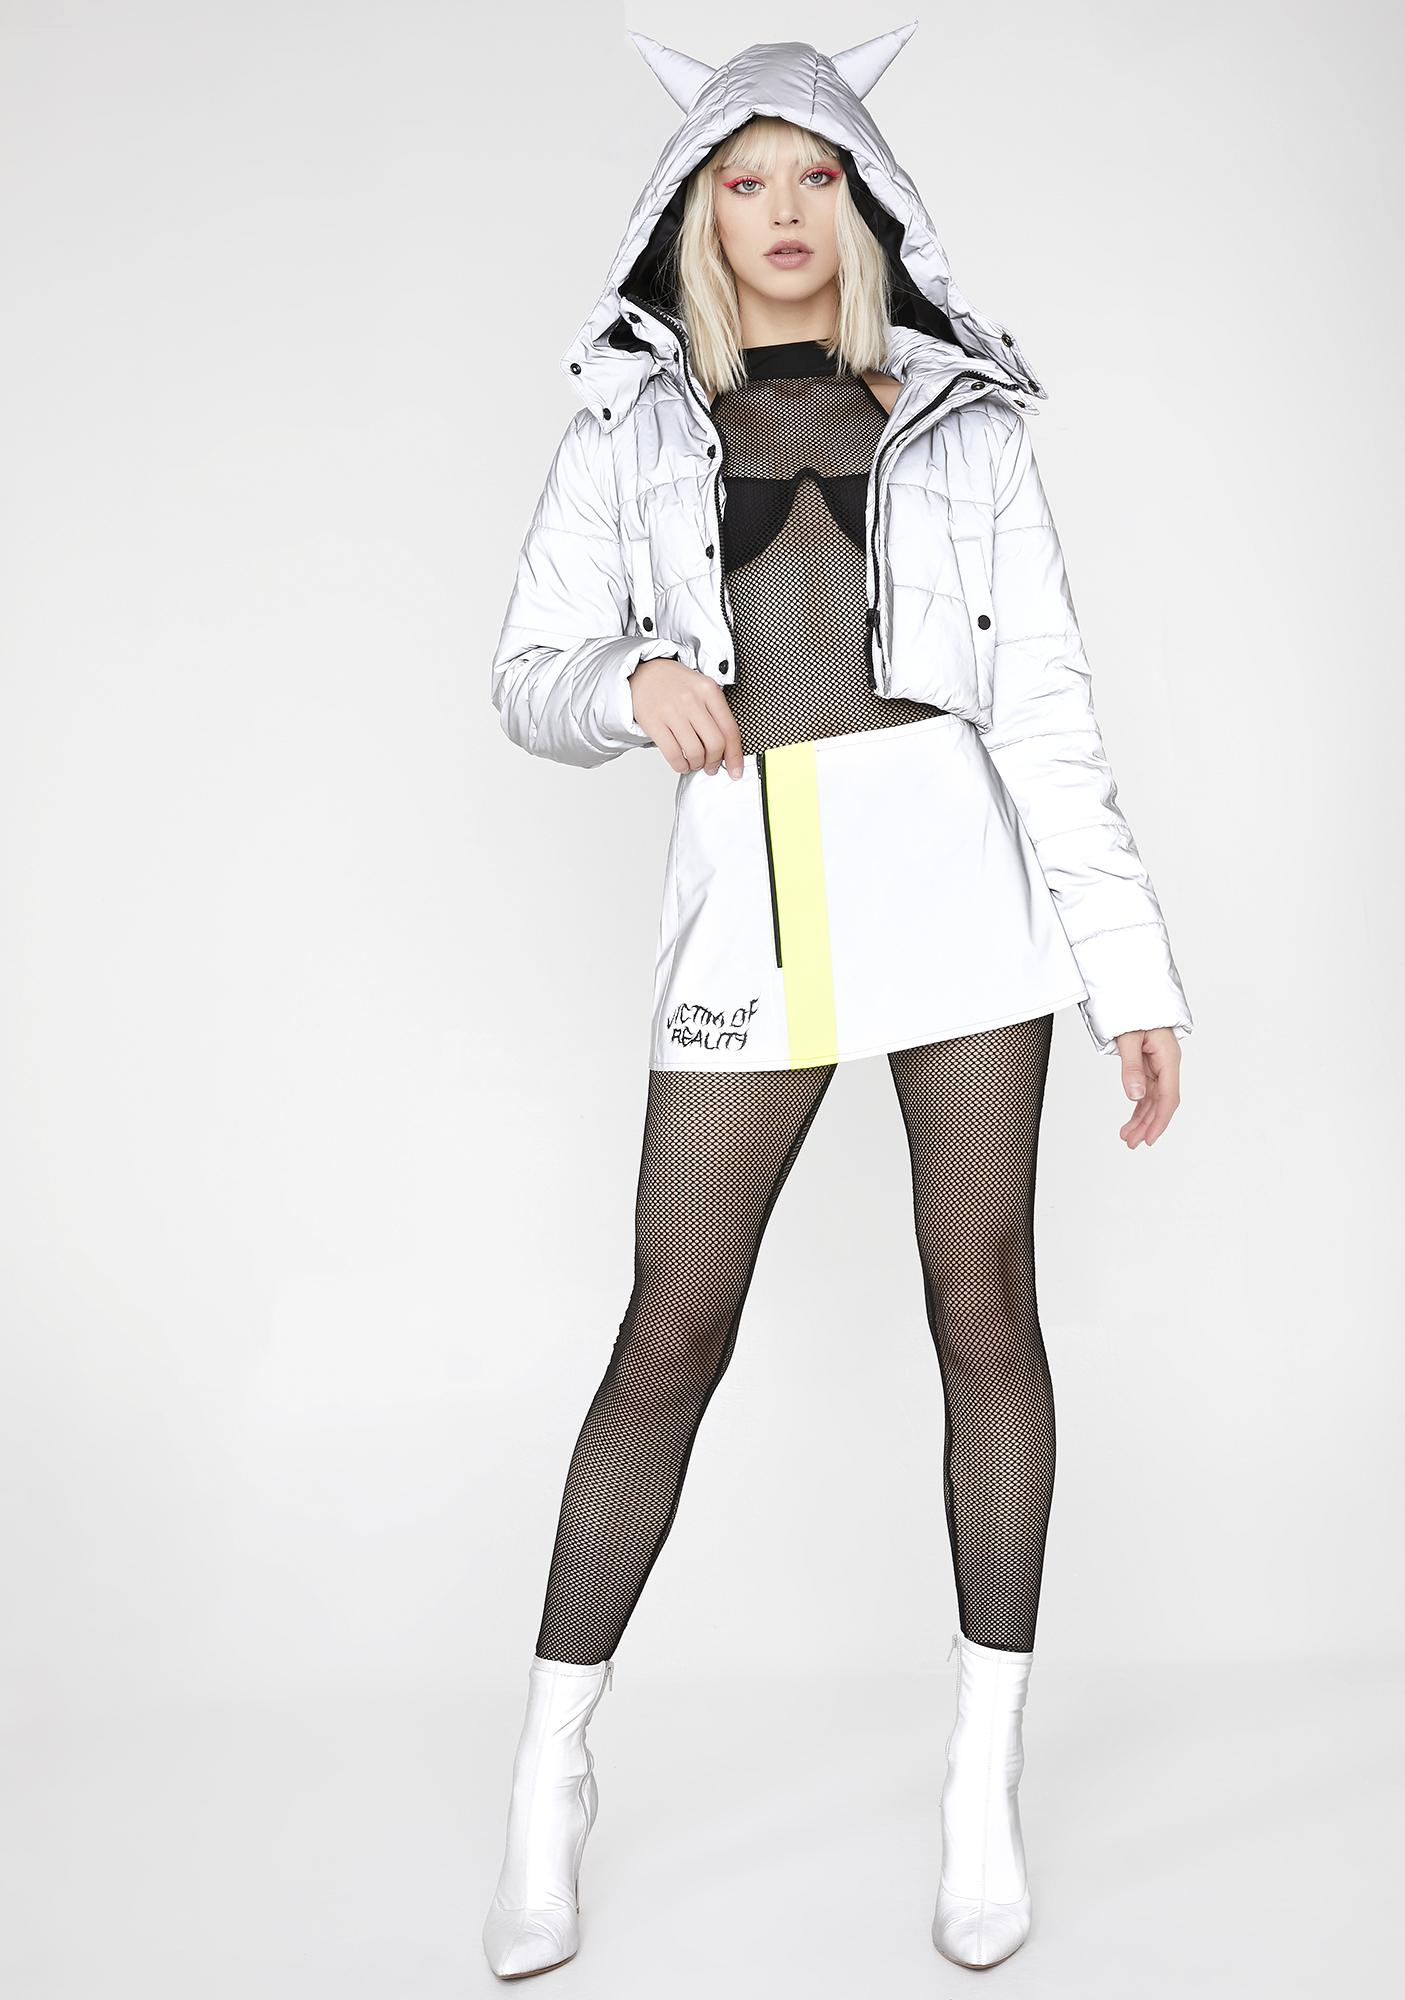 Freckled Ace Hi-Viz Club Reflective Skirt